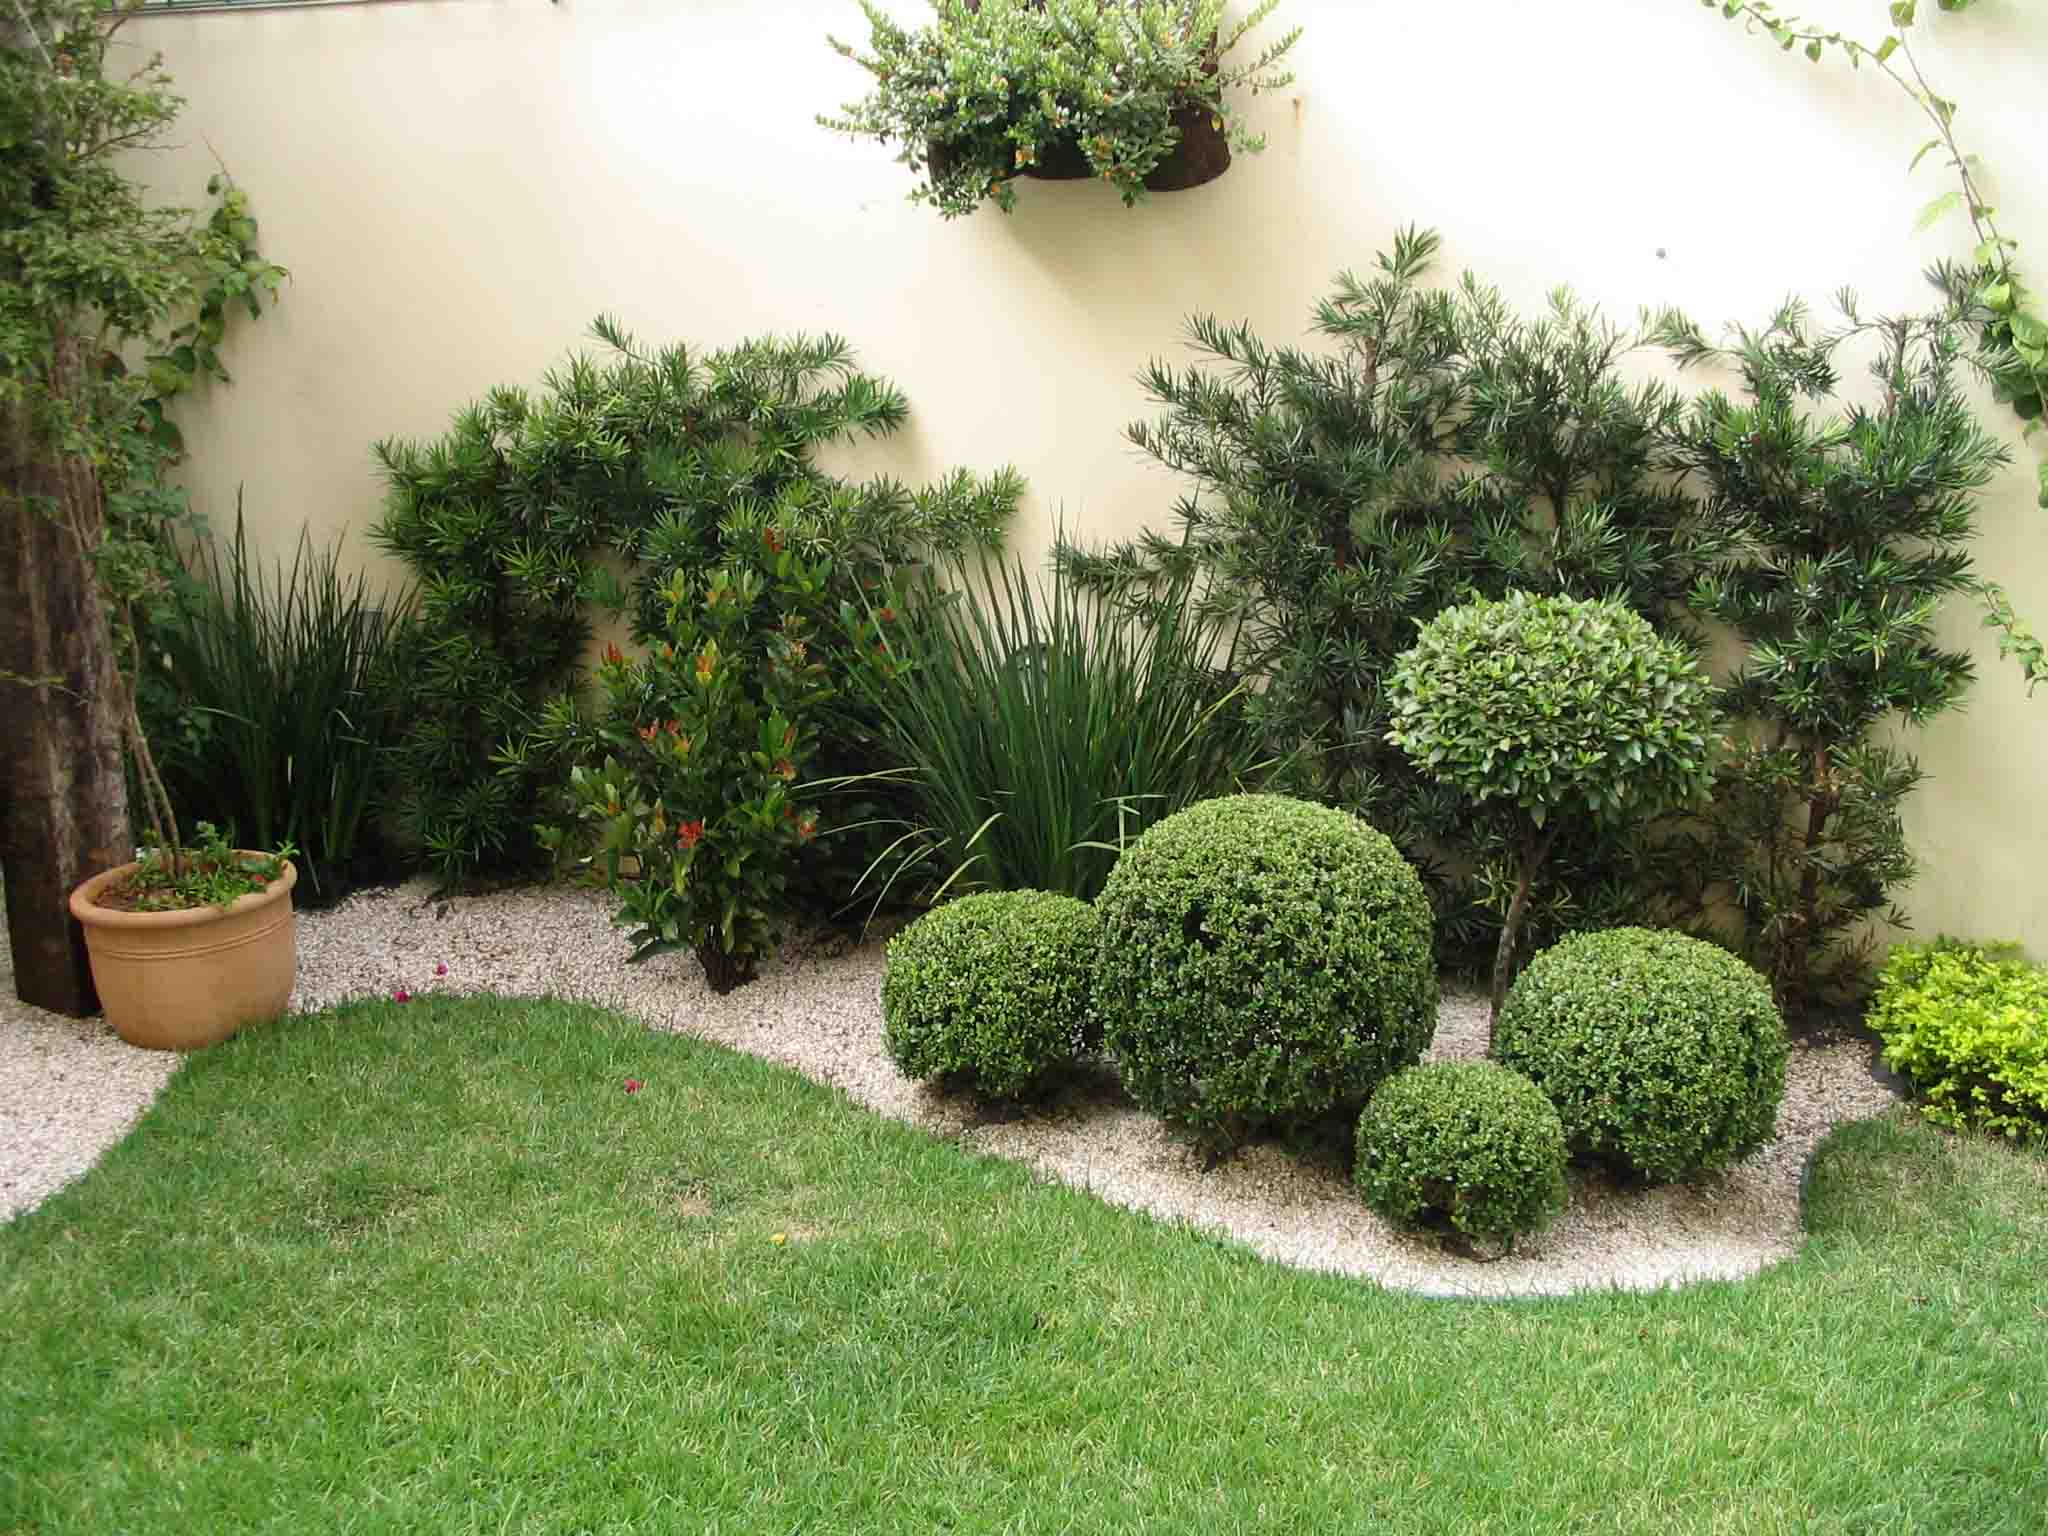 jardins pedras fotos:Decoracao De Jardim Pequeno